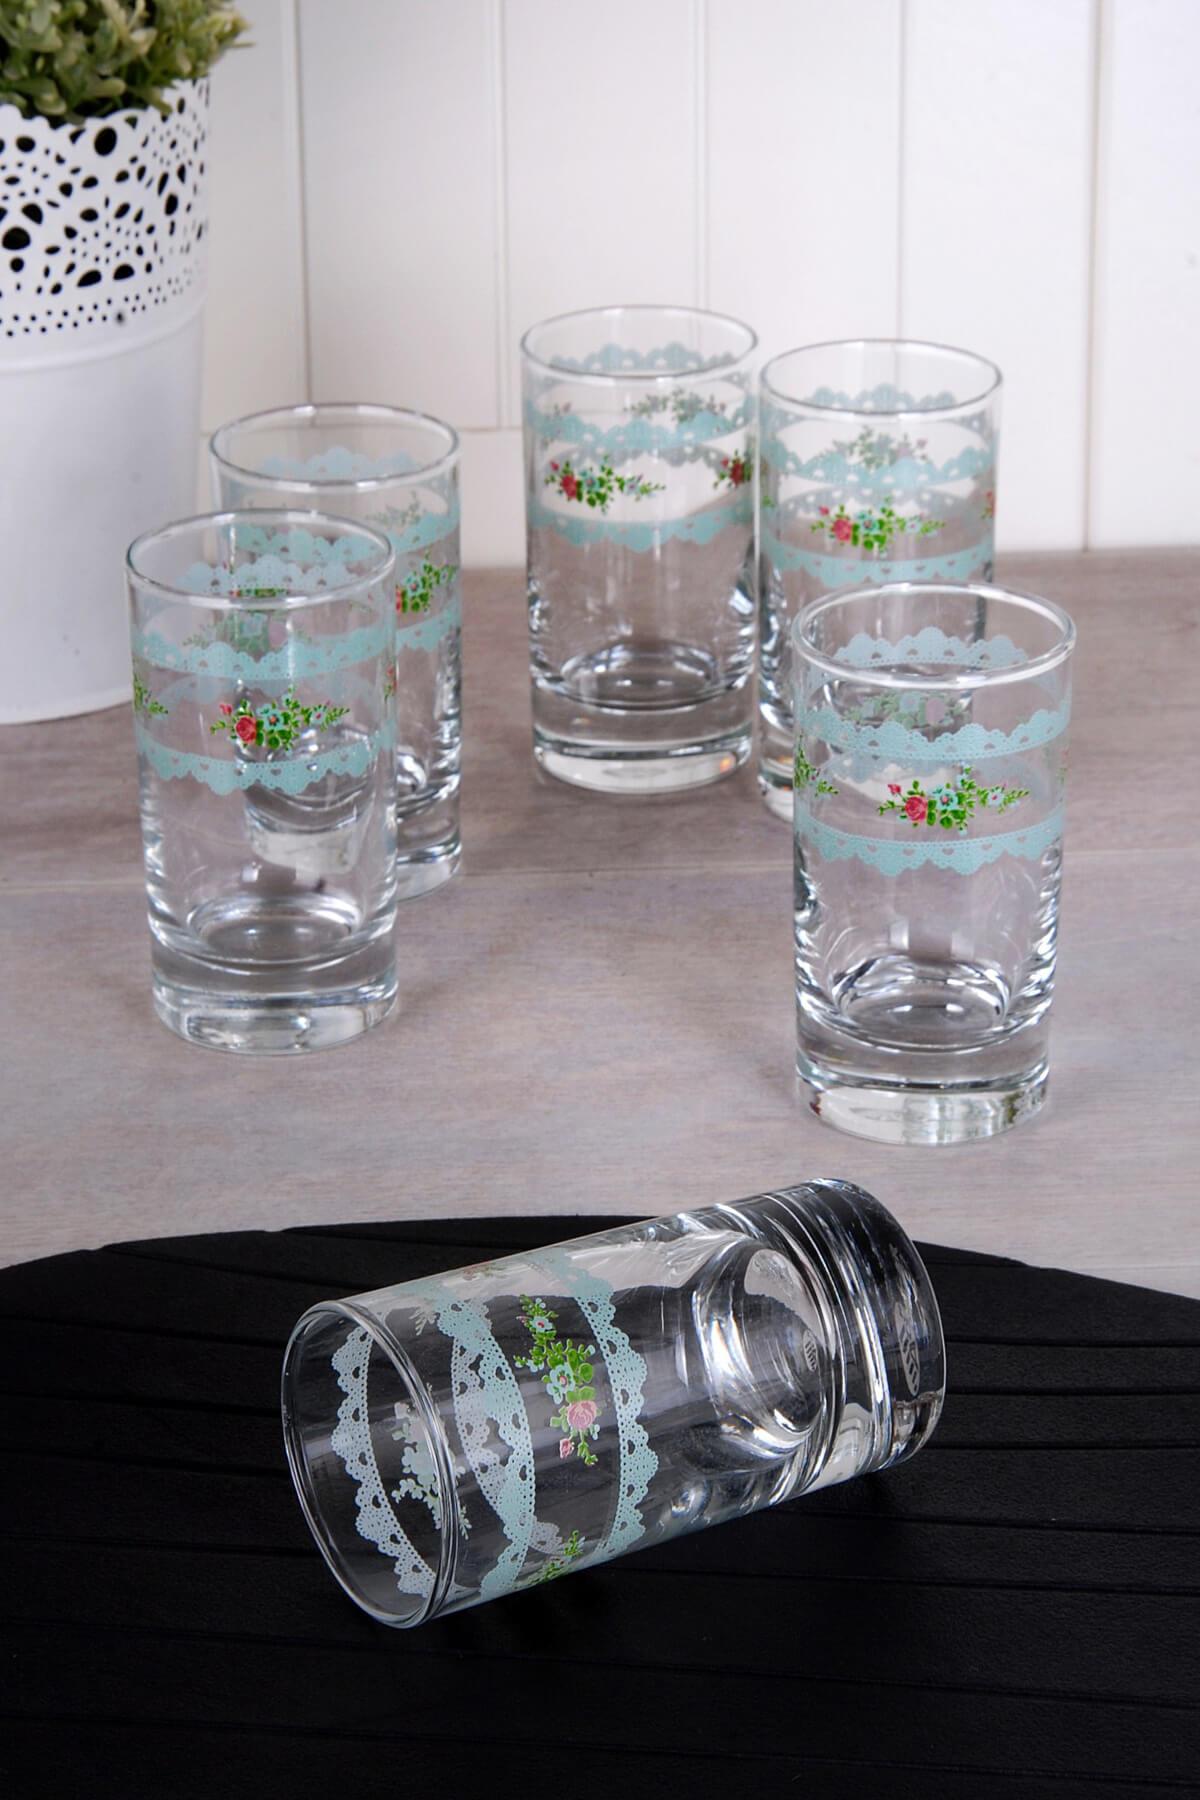 LA VİTA BUONE Kahve Yanı Su Bardağı Vintage A-ACR-033 1